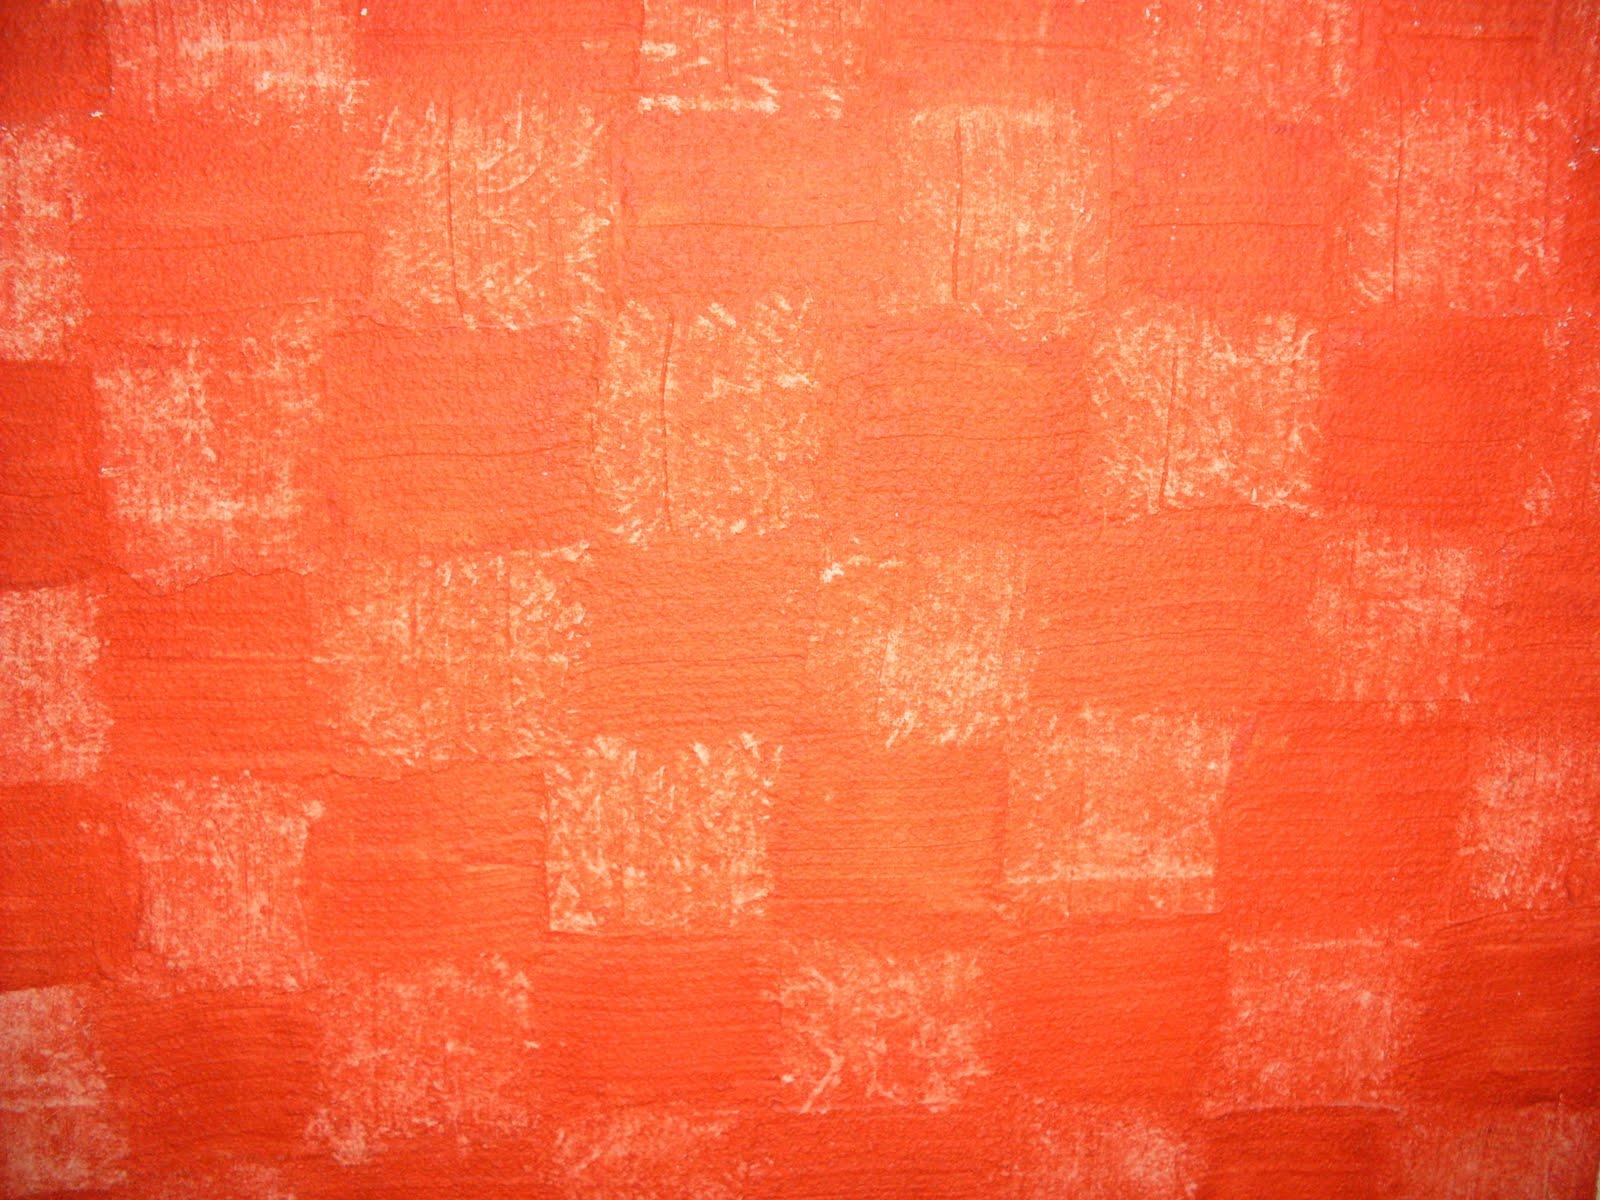 Pinturas Em Geral Texturas Paredes Decorativas